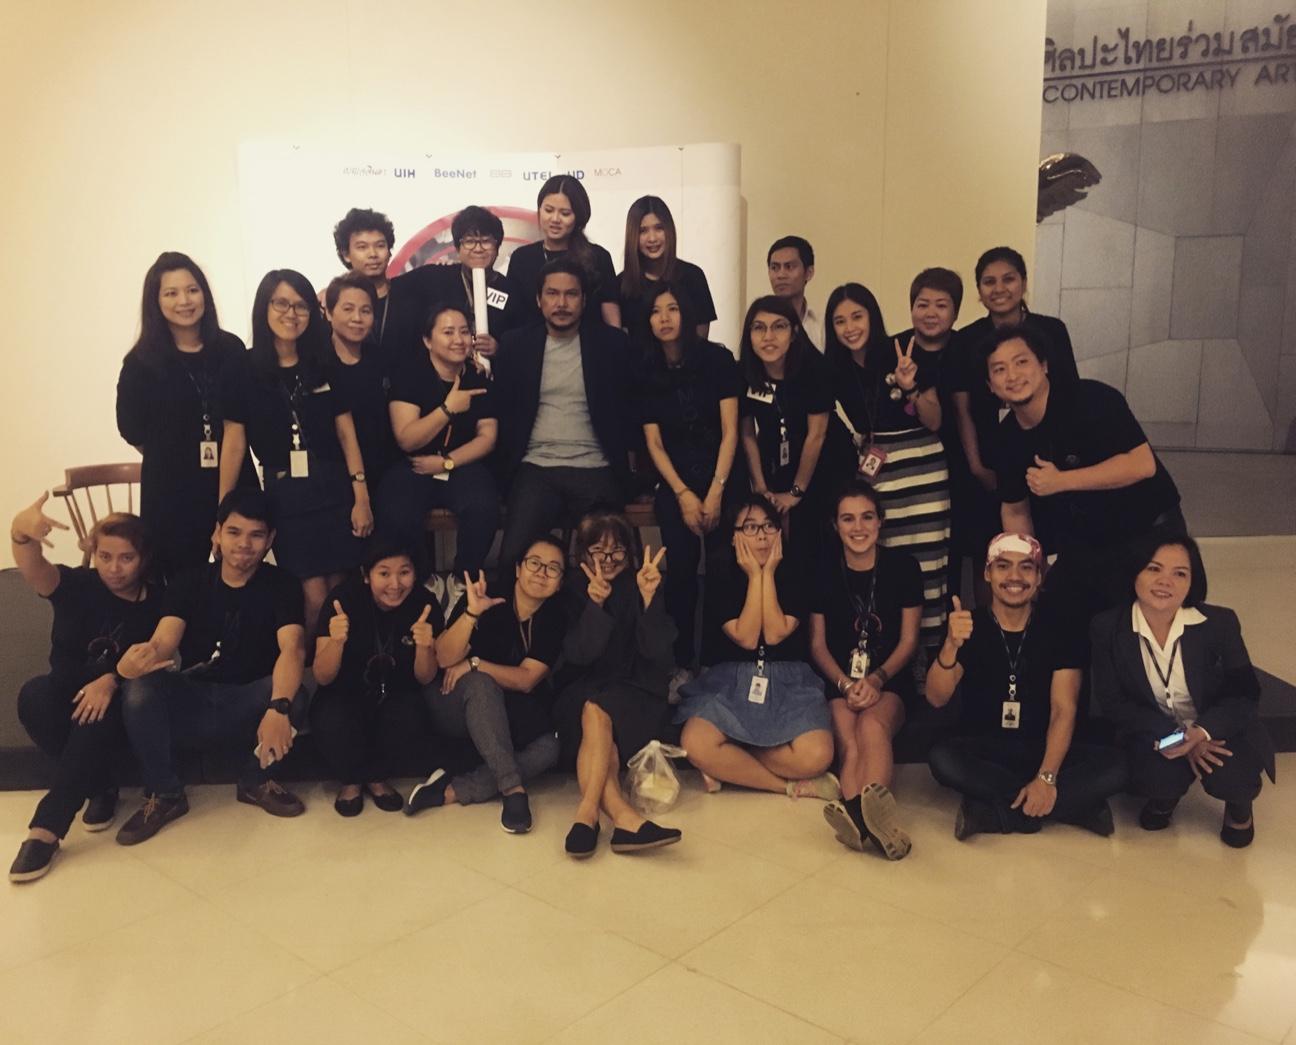 MOCA staff with Prateep Kochabua (well-regarded Thai artist) at the 'Fantasur' exhibition opening.